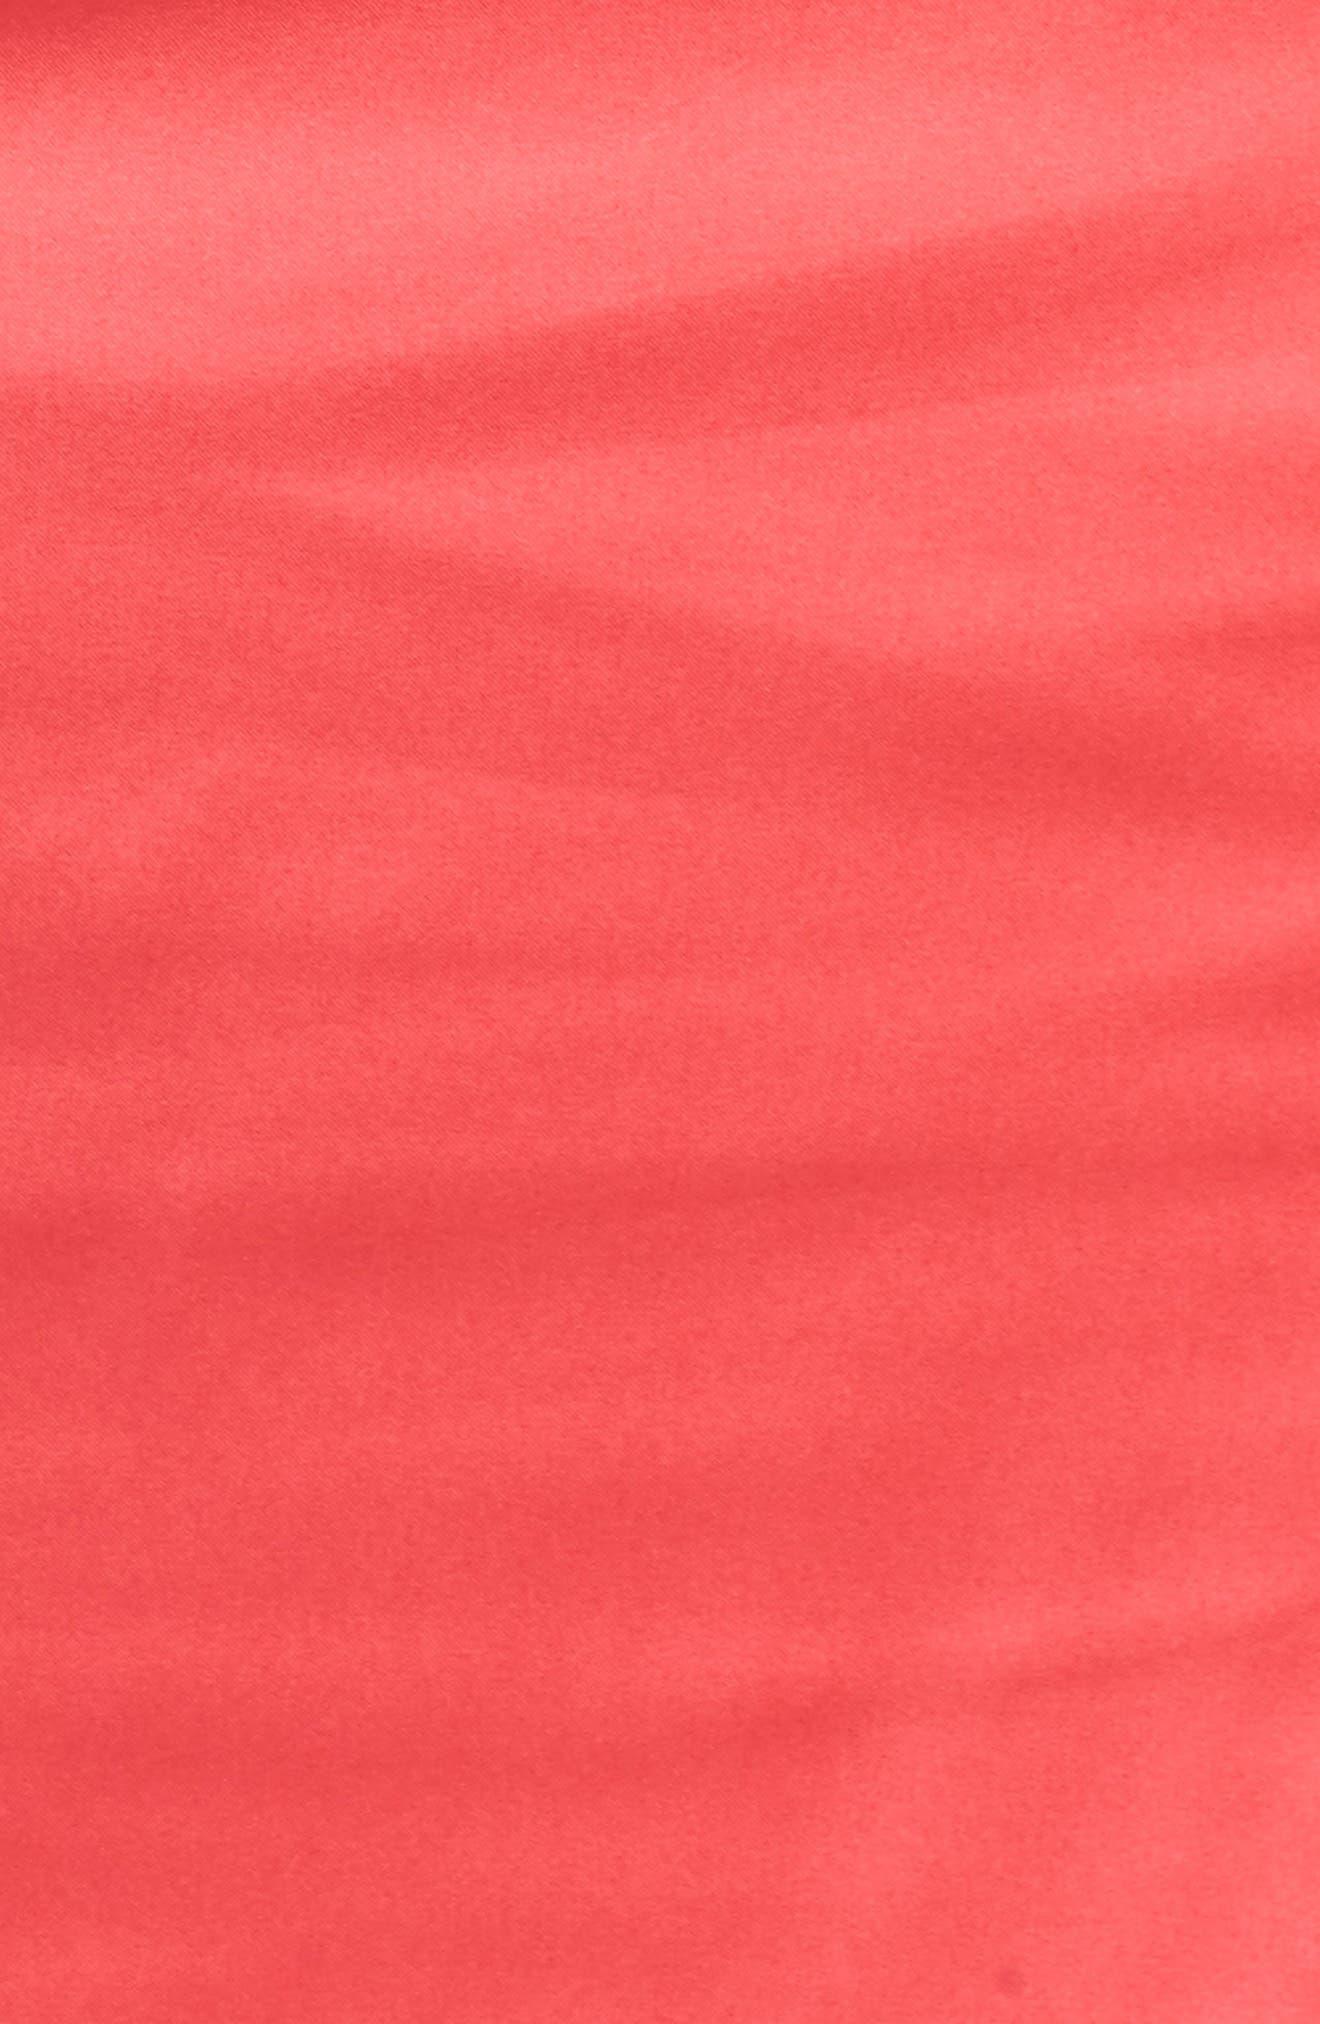 Collared Faux Wrap Dress,                             Alternate thumbnail 5, color,                             699